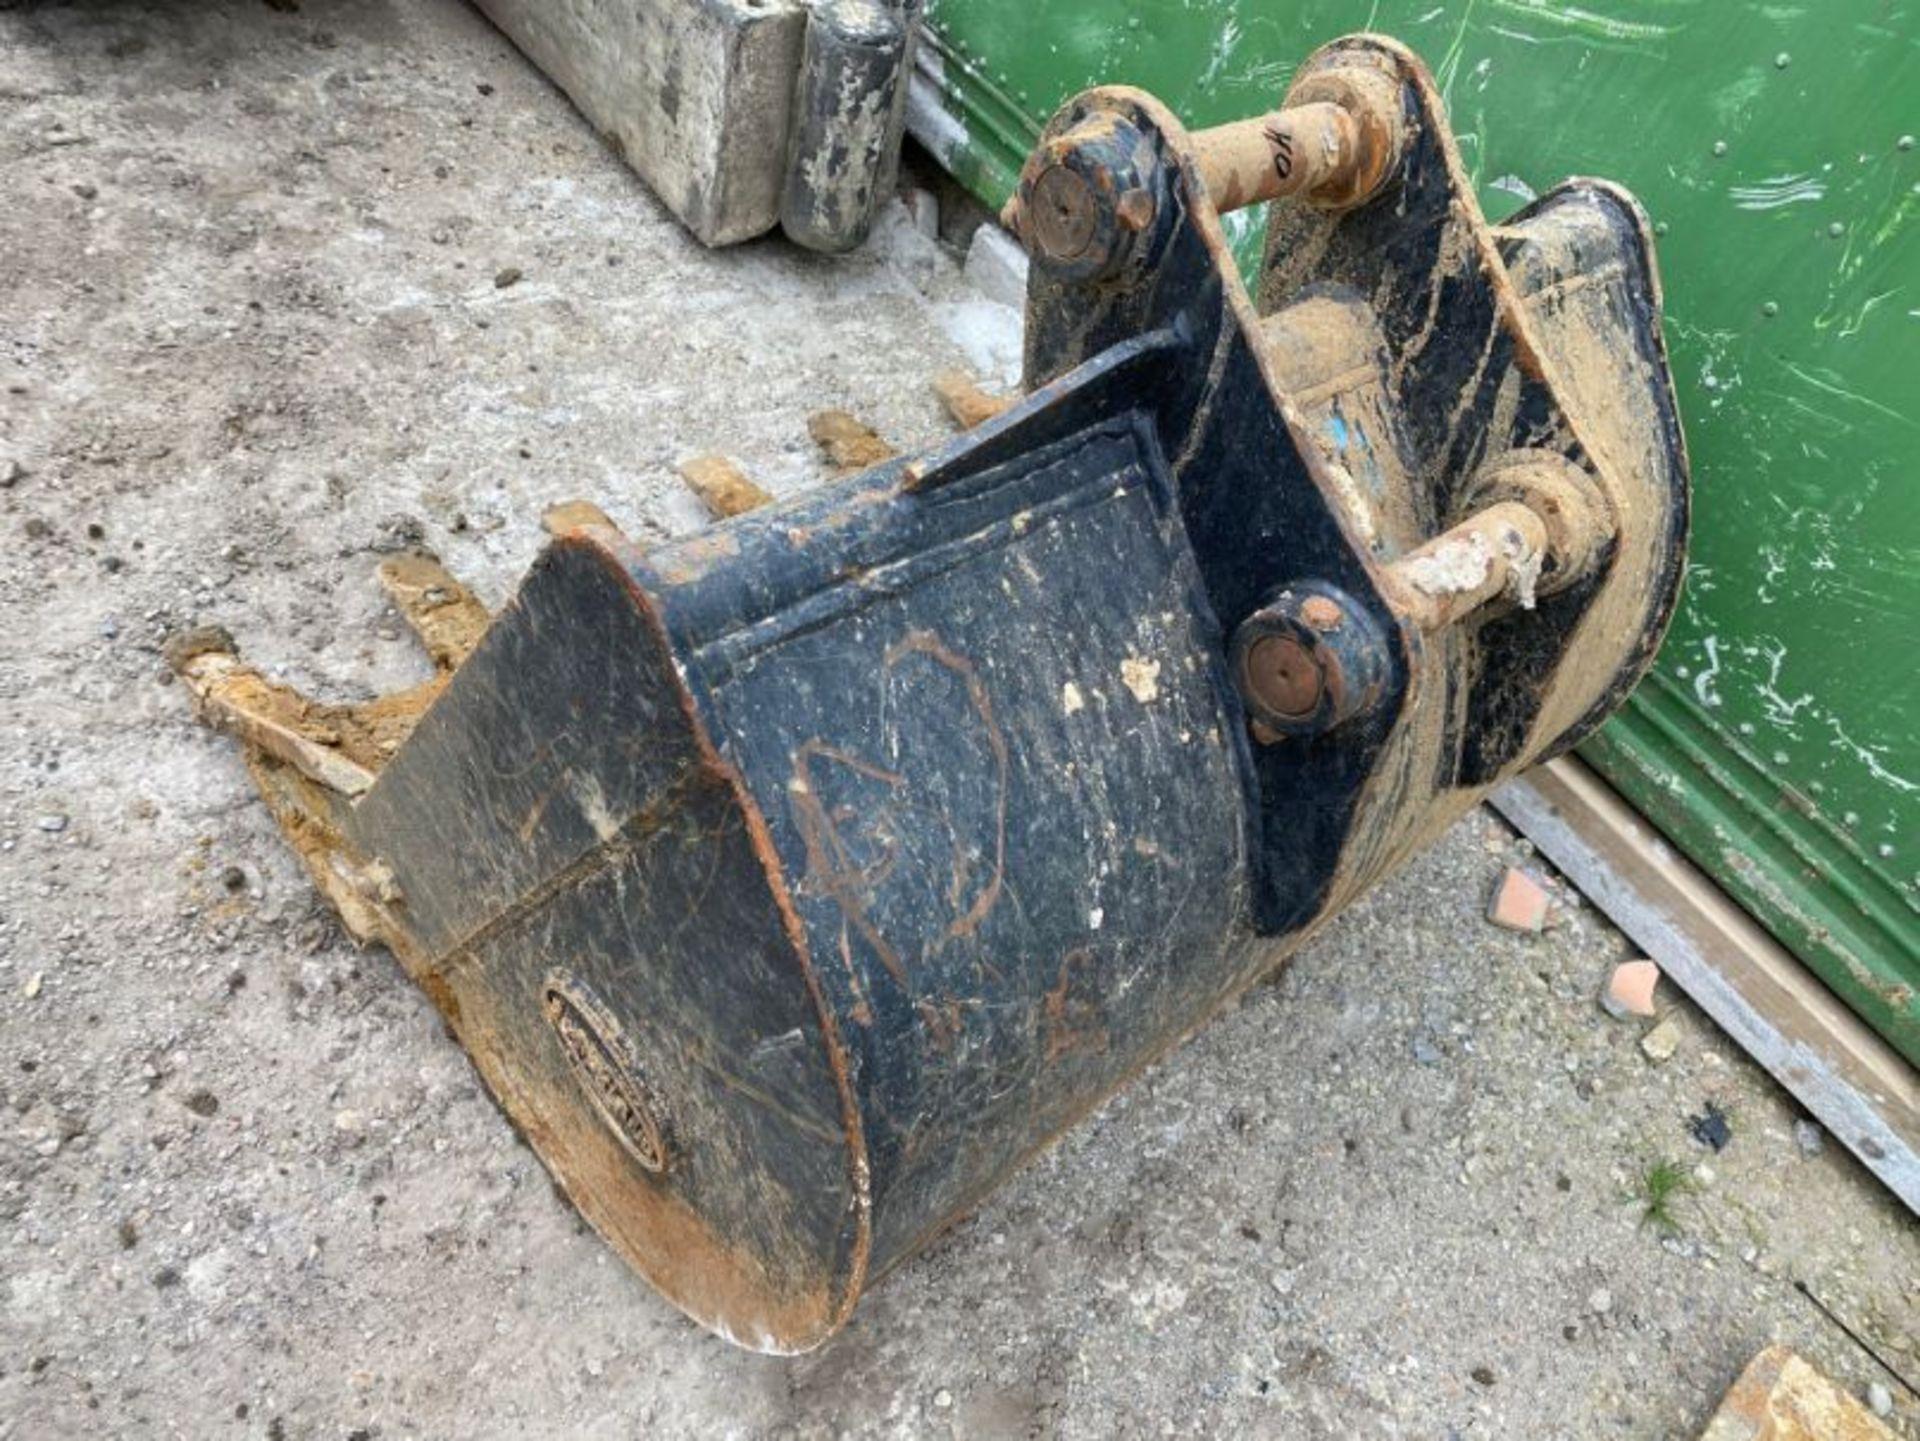 "Lot 40 - Strickland 36"" excavator bucket (no age ID): 1.75"" dia pin x 6"" dipper x 10"" between centres"